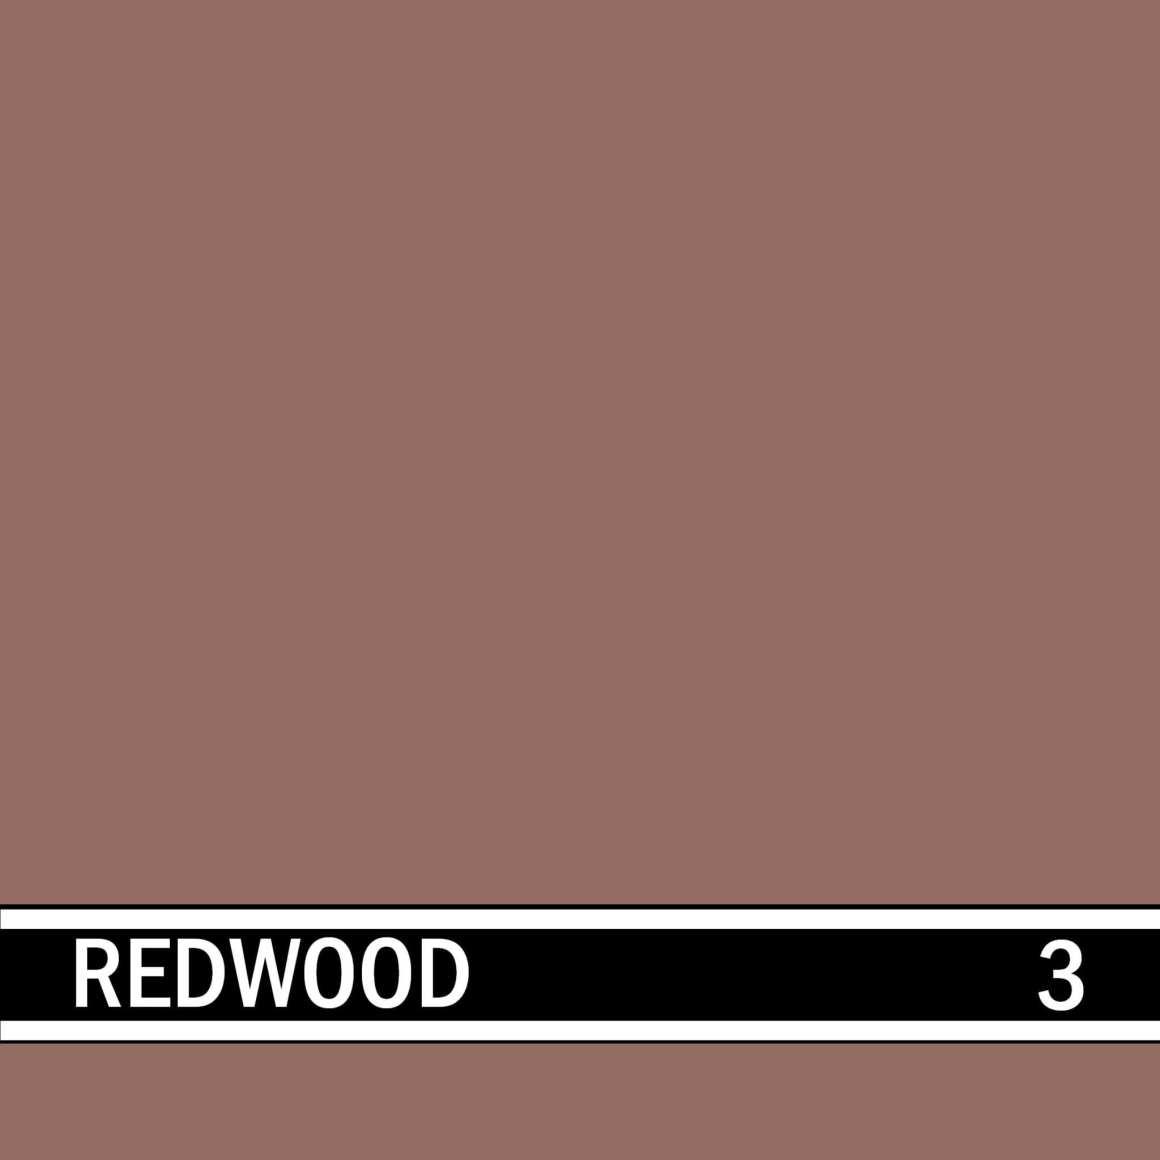 Redwood integral concrete color for stamped concrete and decorative colored concrete